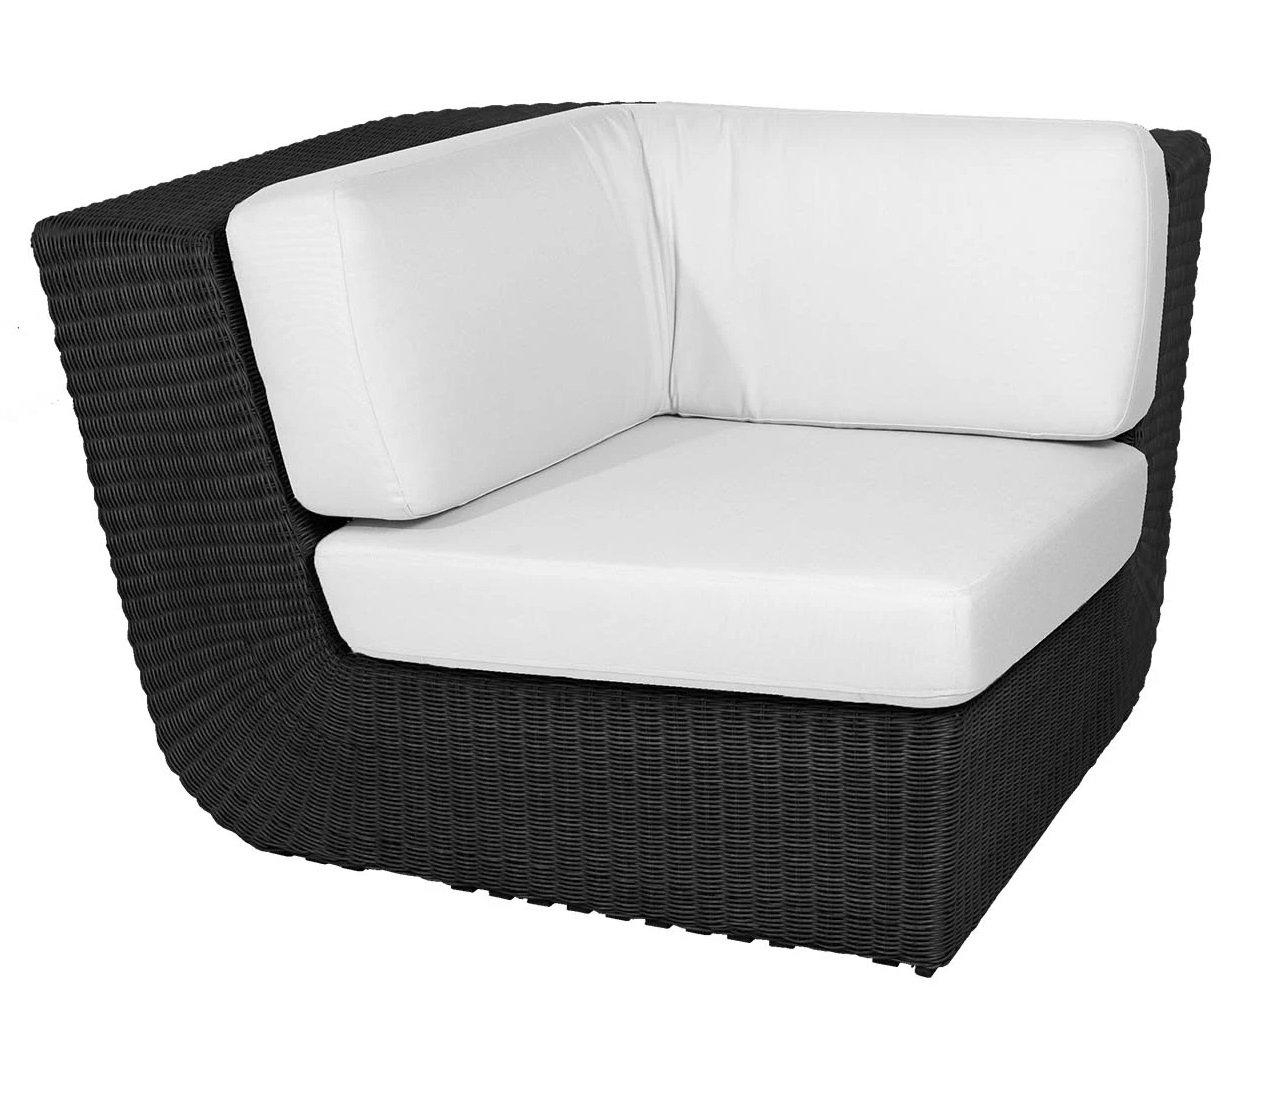 Savannah Corner Module Sofa modular from Cane-line, designed by Foersom & Hiort-Lorenzen MDD